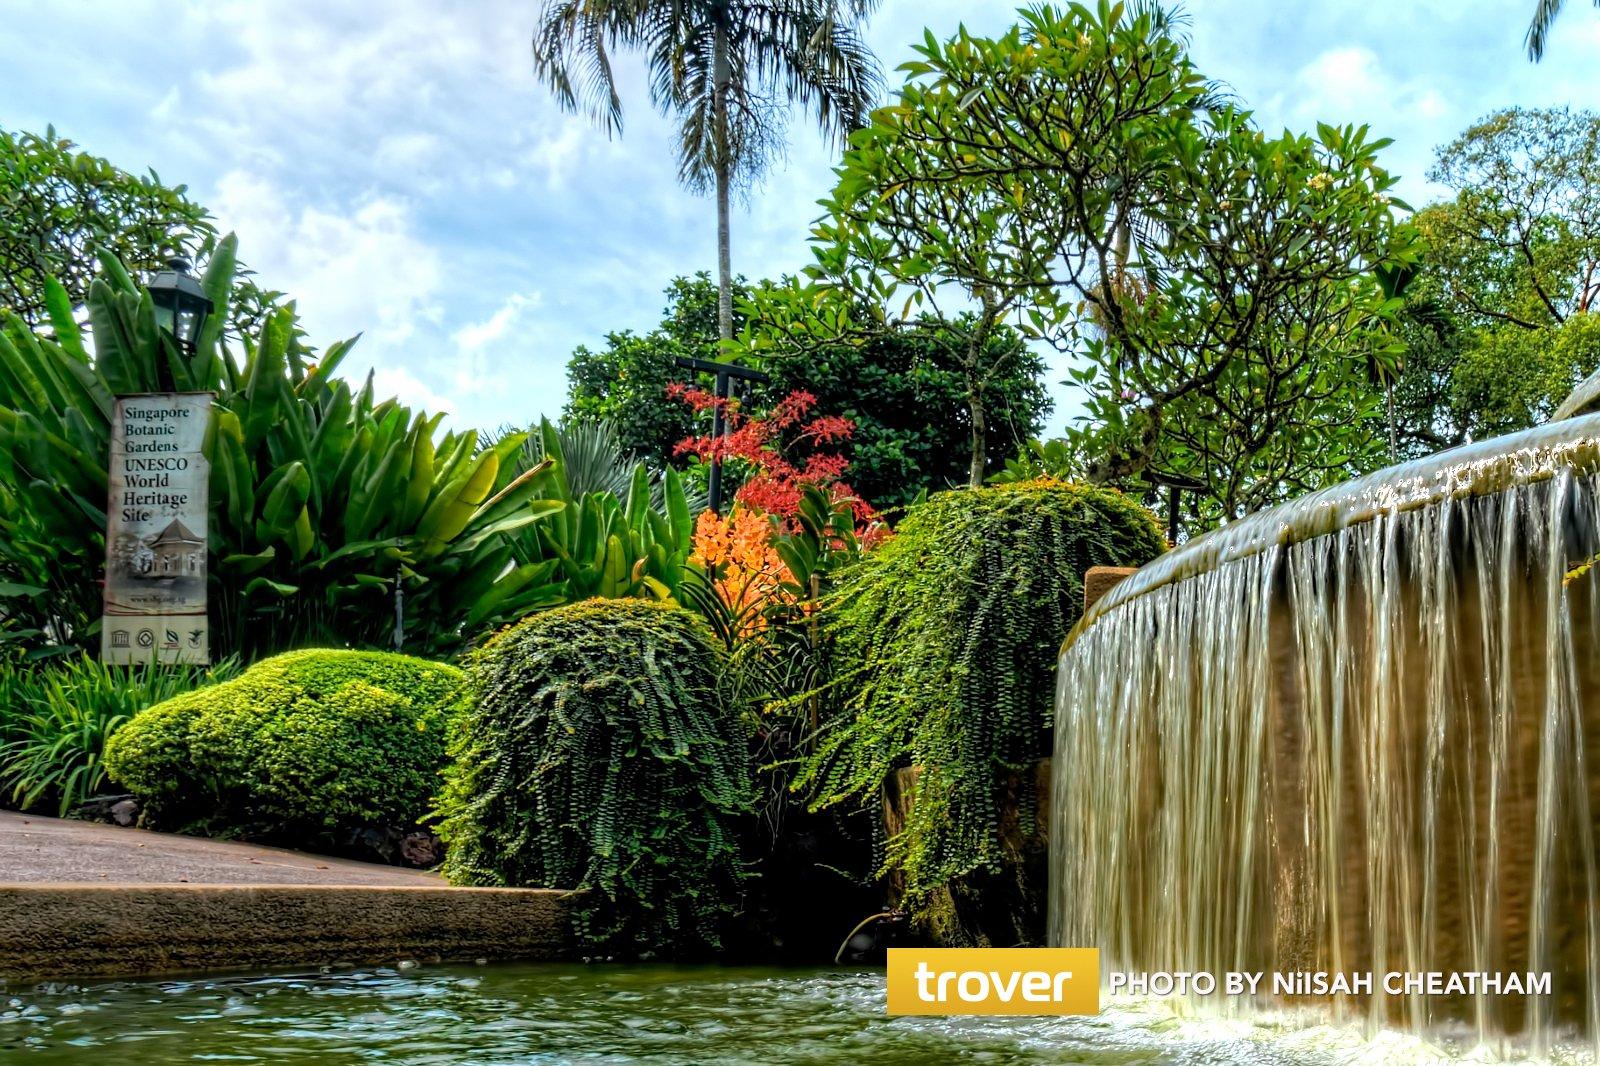 Singapore Botanic Gardens World Heritage Site In The Heart Of Singapore